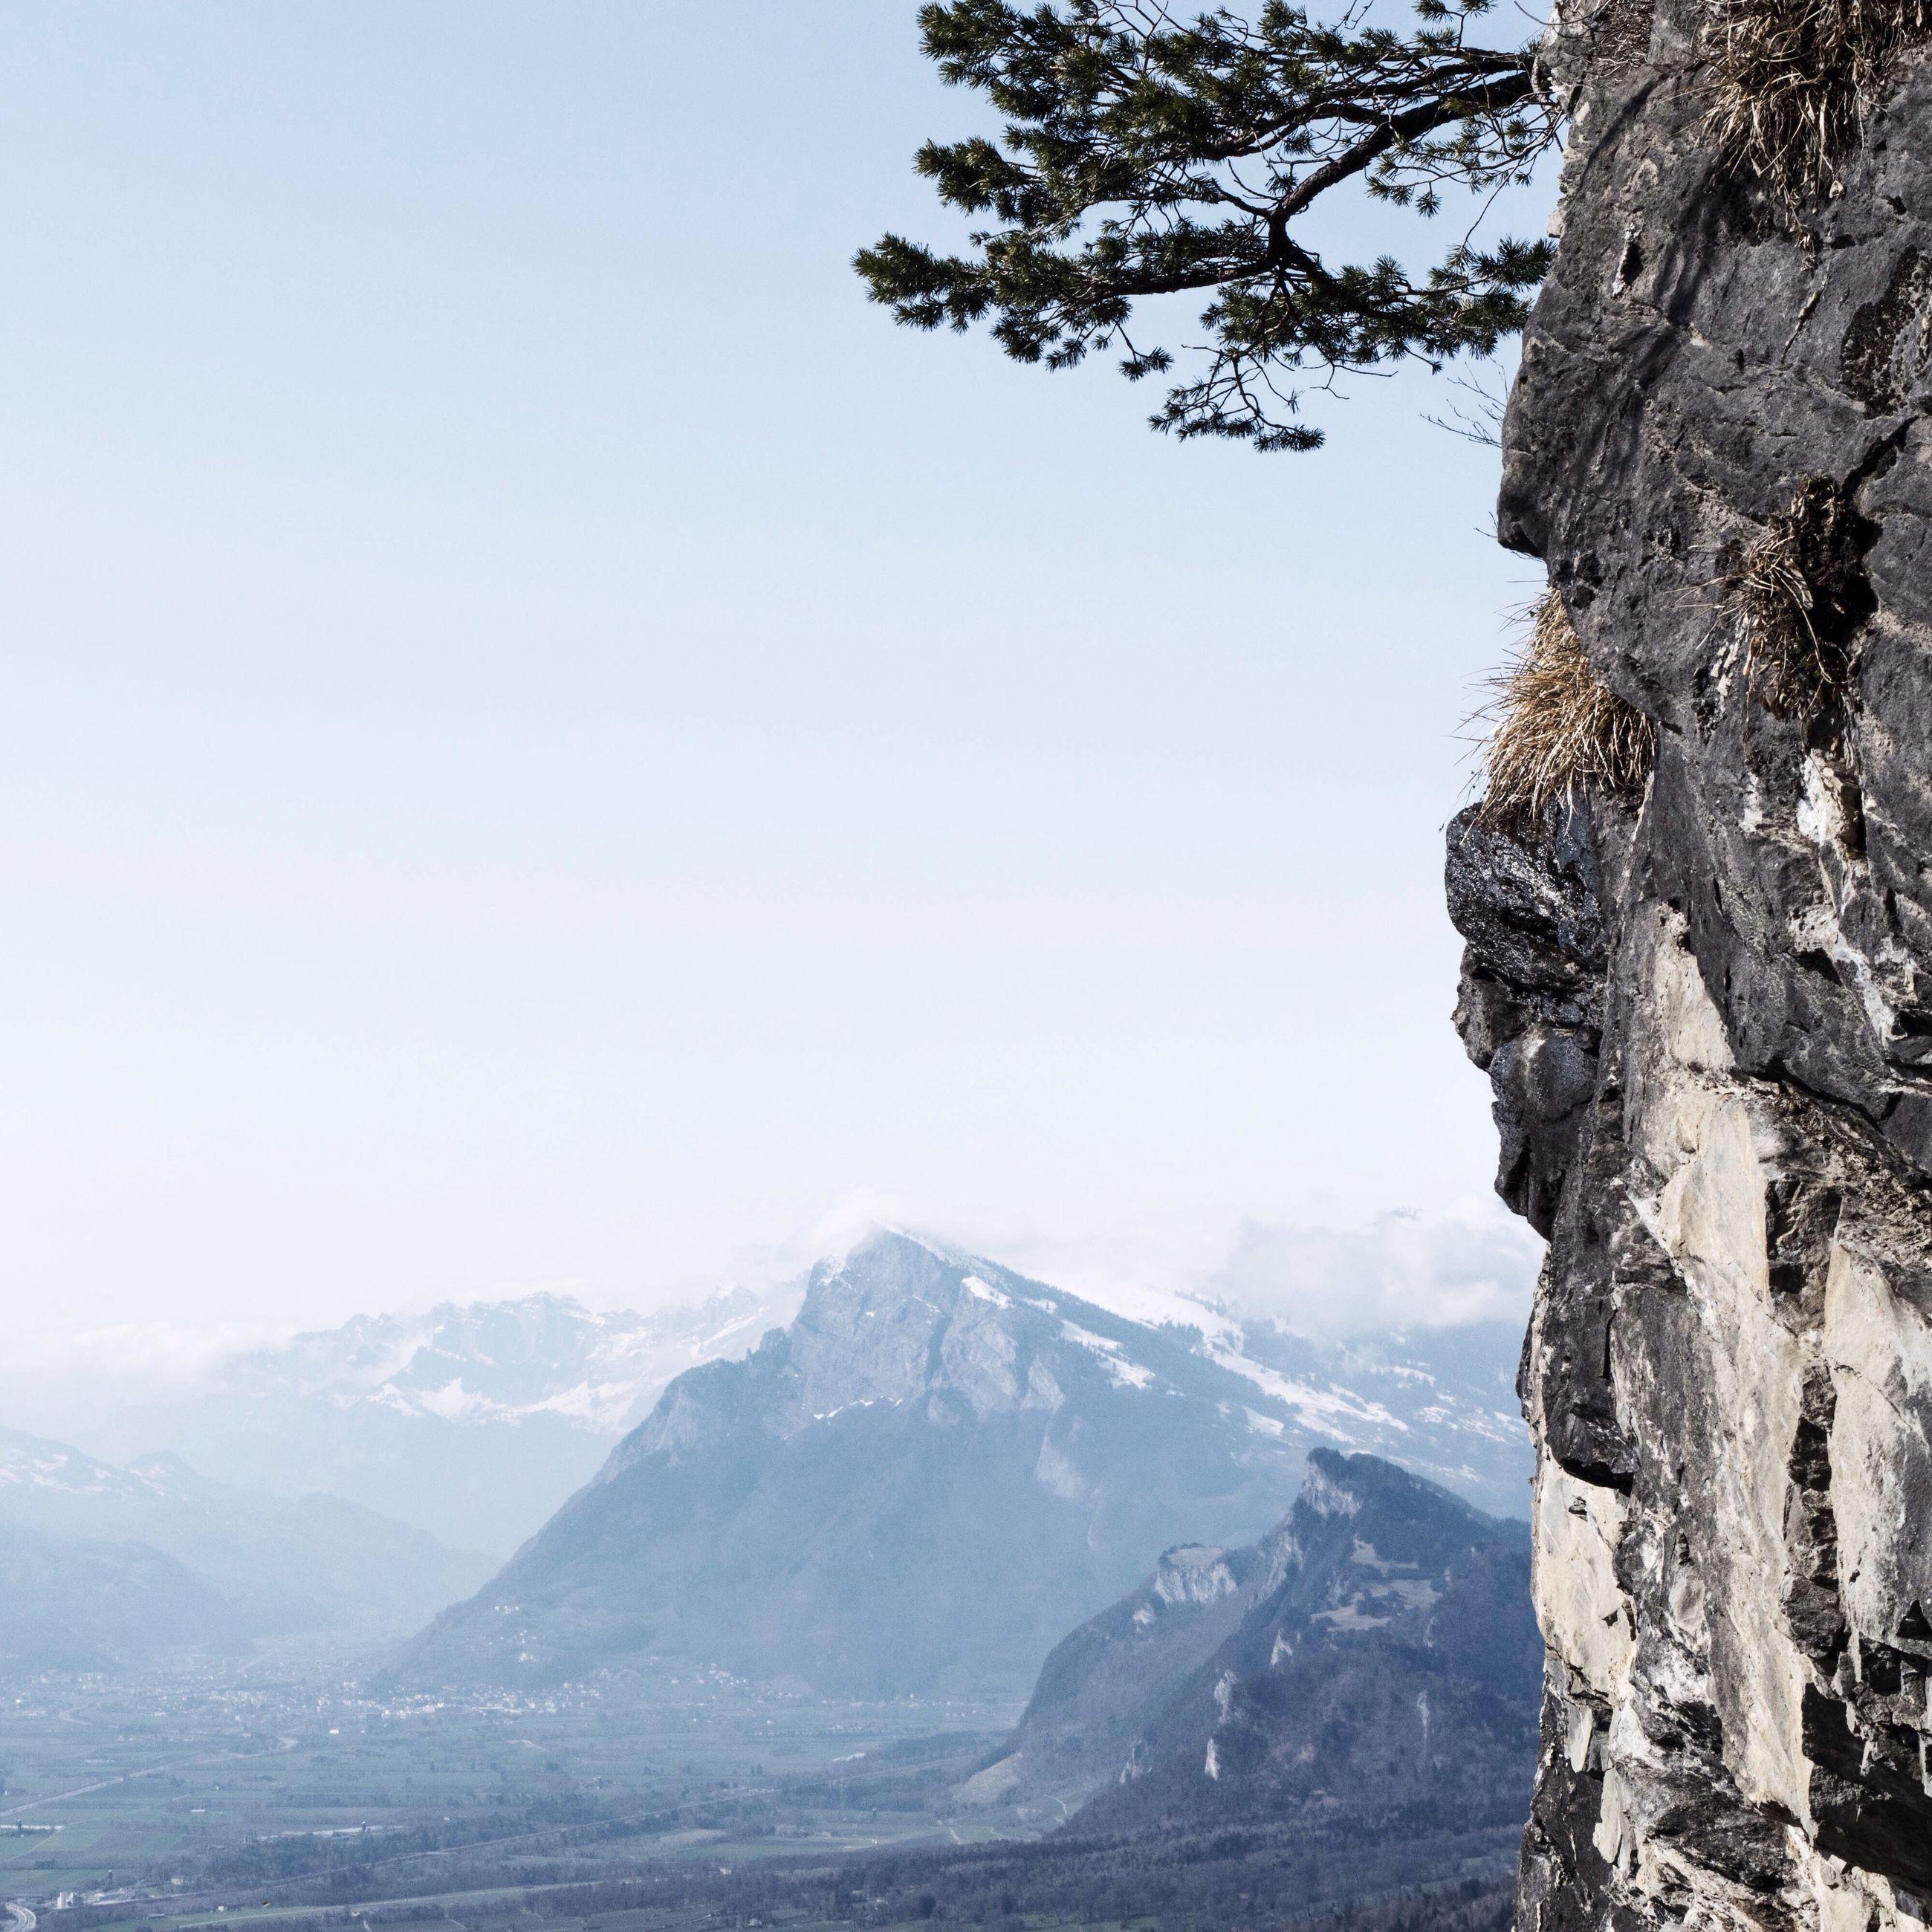 mountain, tranquility, tranquil scene, scenics, beauty in nature, clear sky, tree, landscape, mountain range, nature, non-urban scene, snow, winter, copy space, cold temperature, idyllic, remote, sky, day